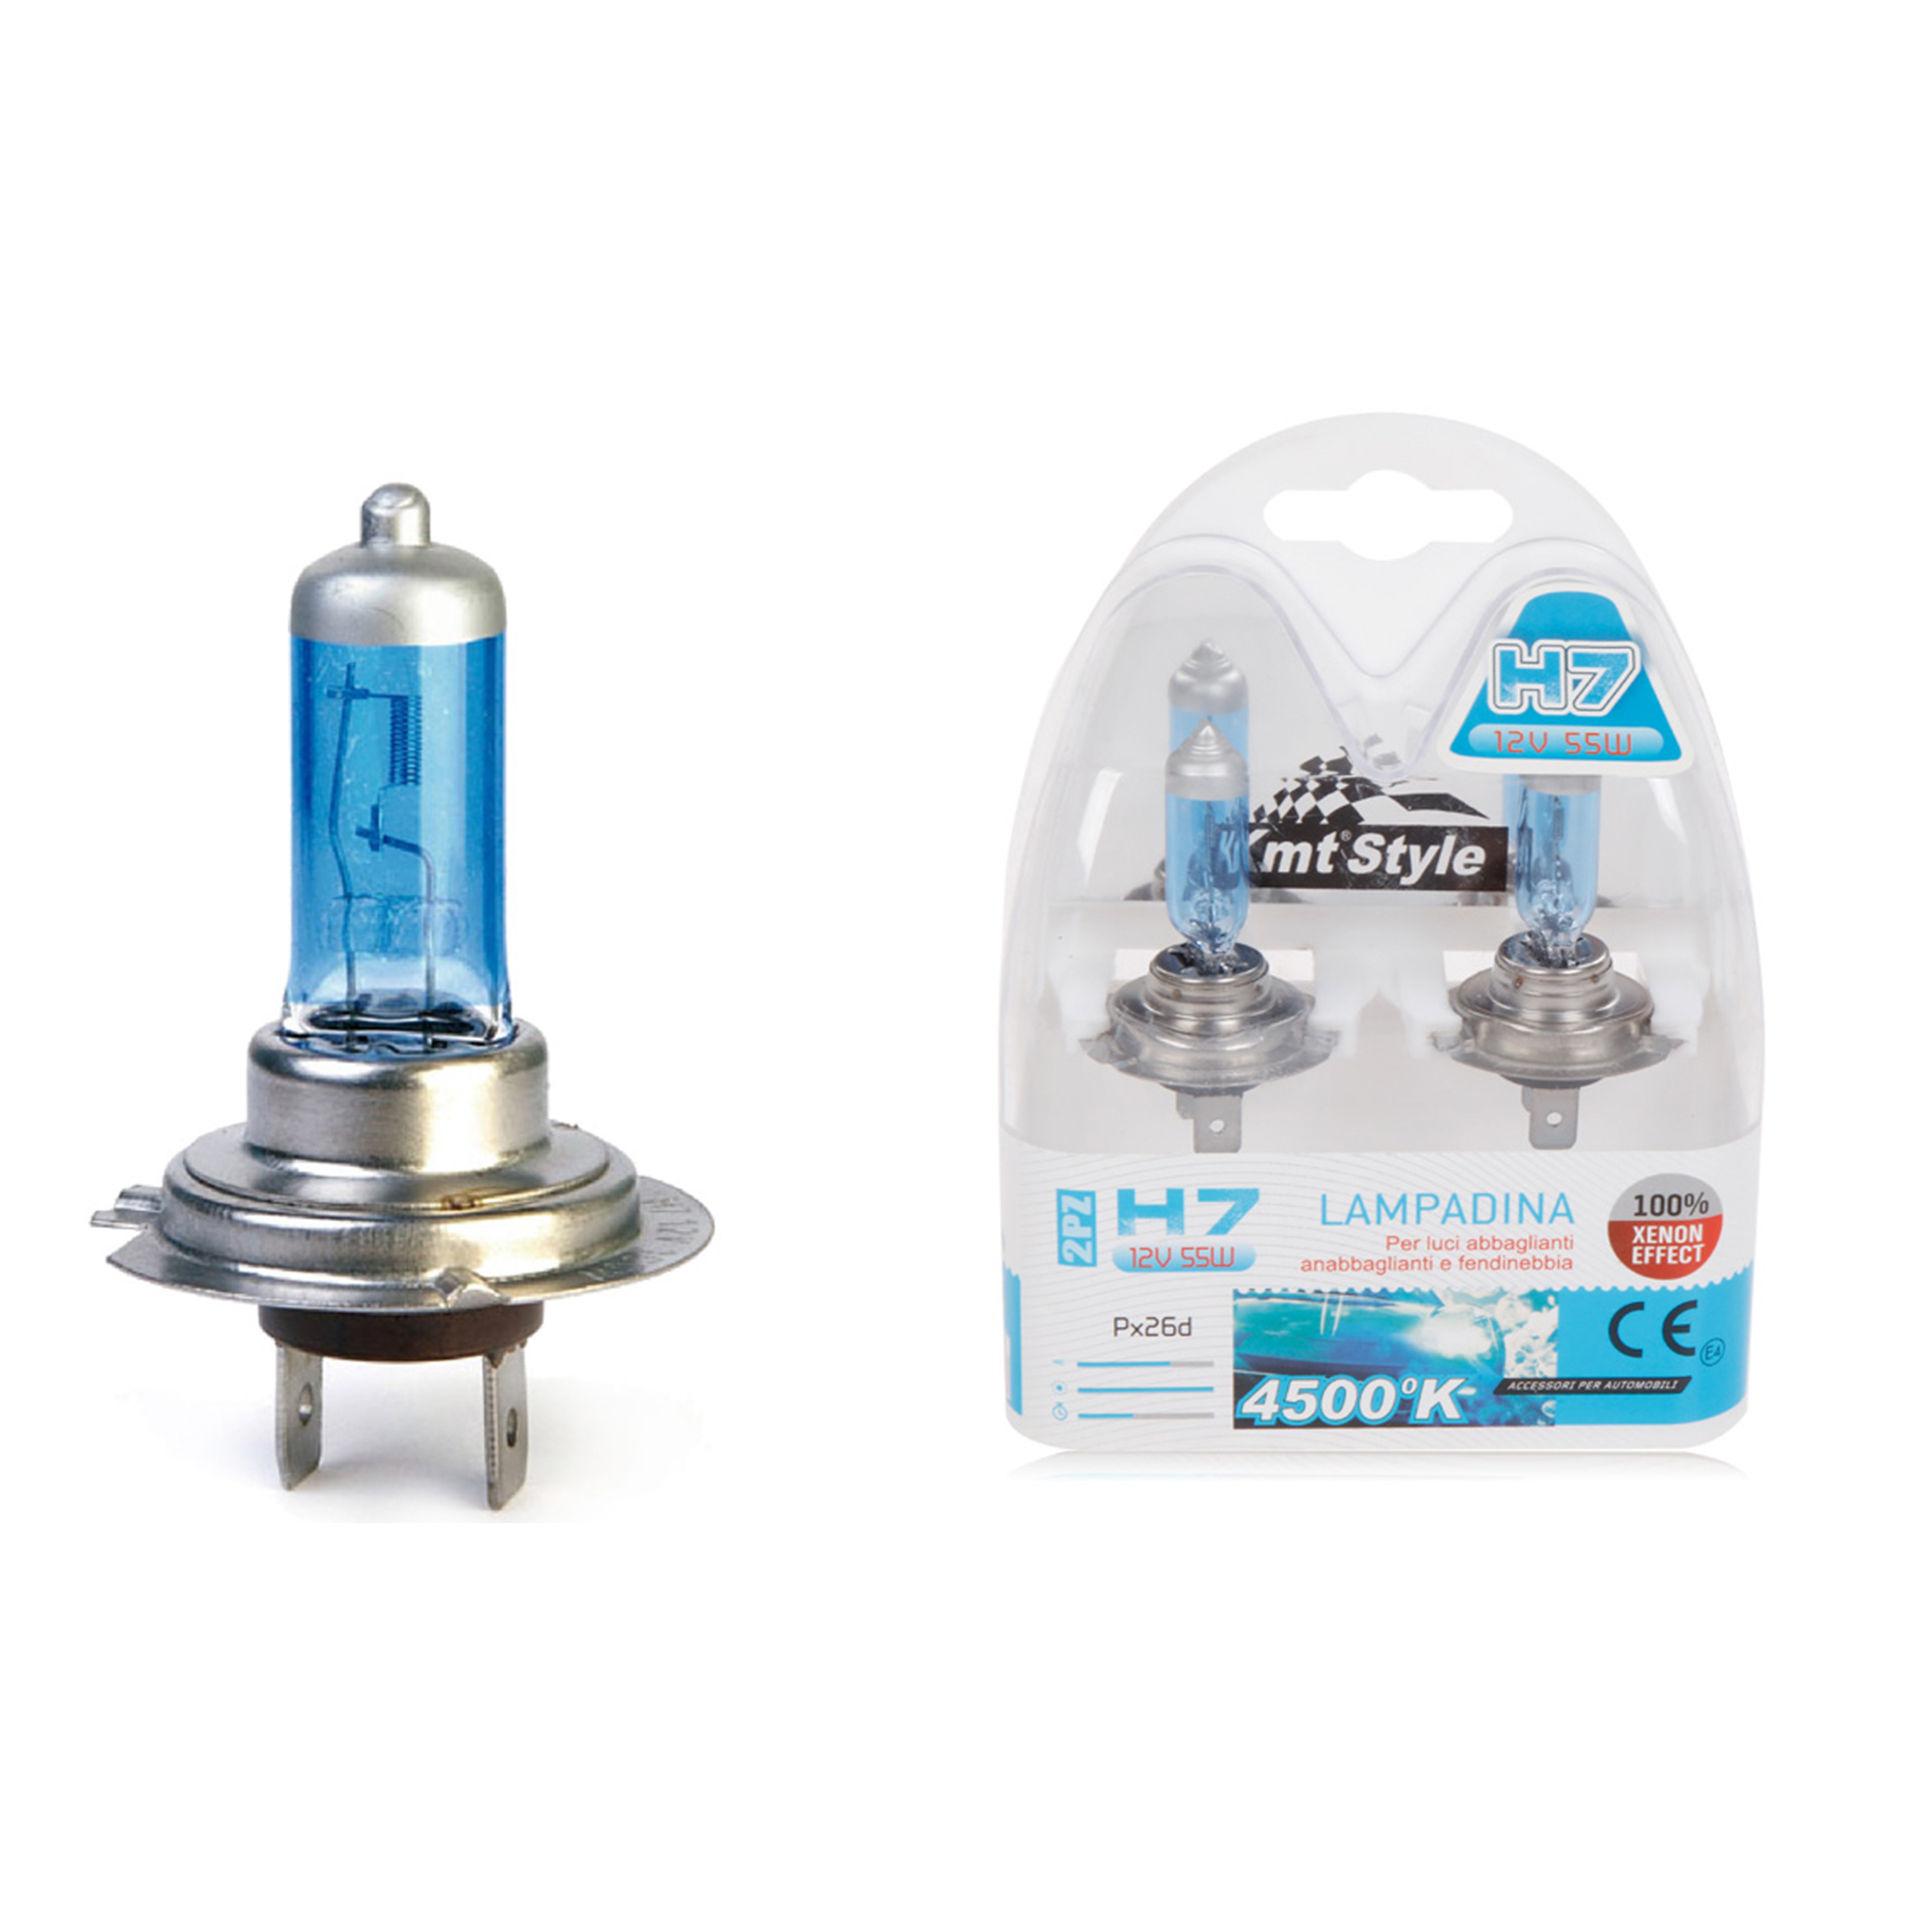 LAMPADA DA AUTO(BLU) H7 12V 55W 2PCSEmi Style